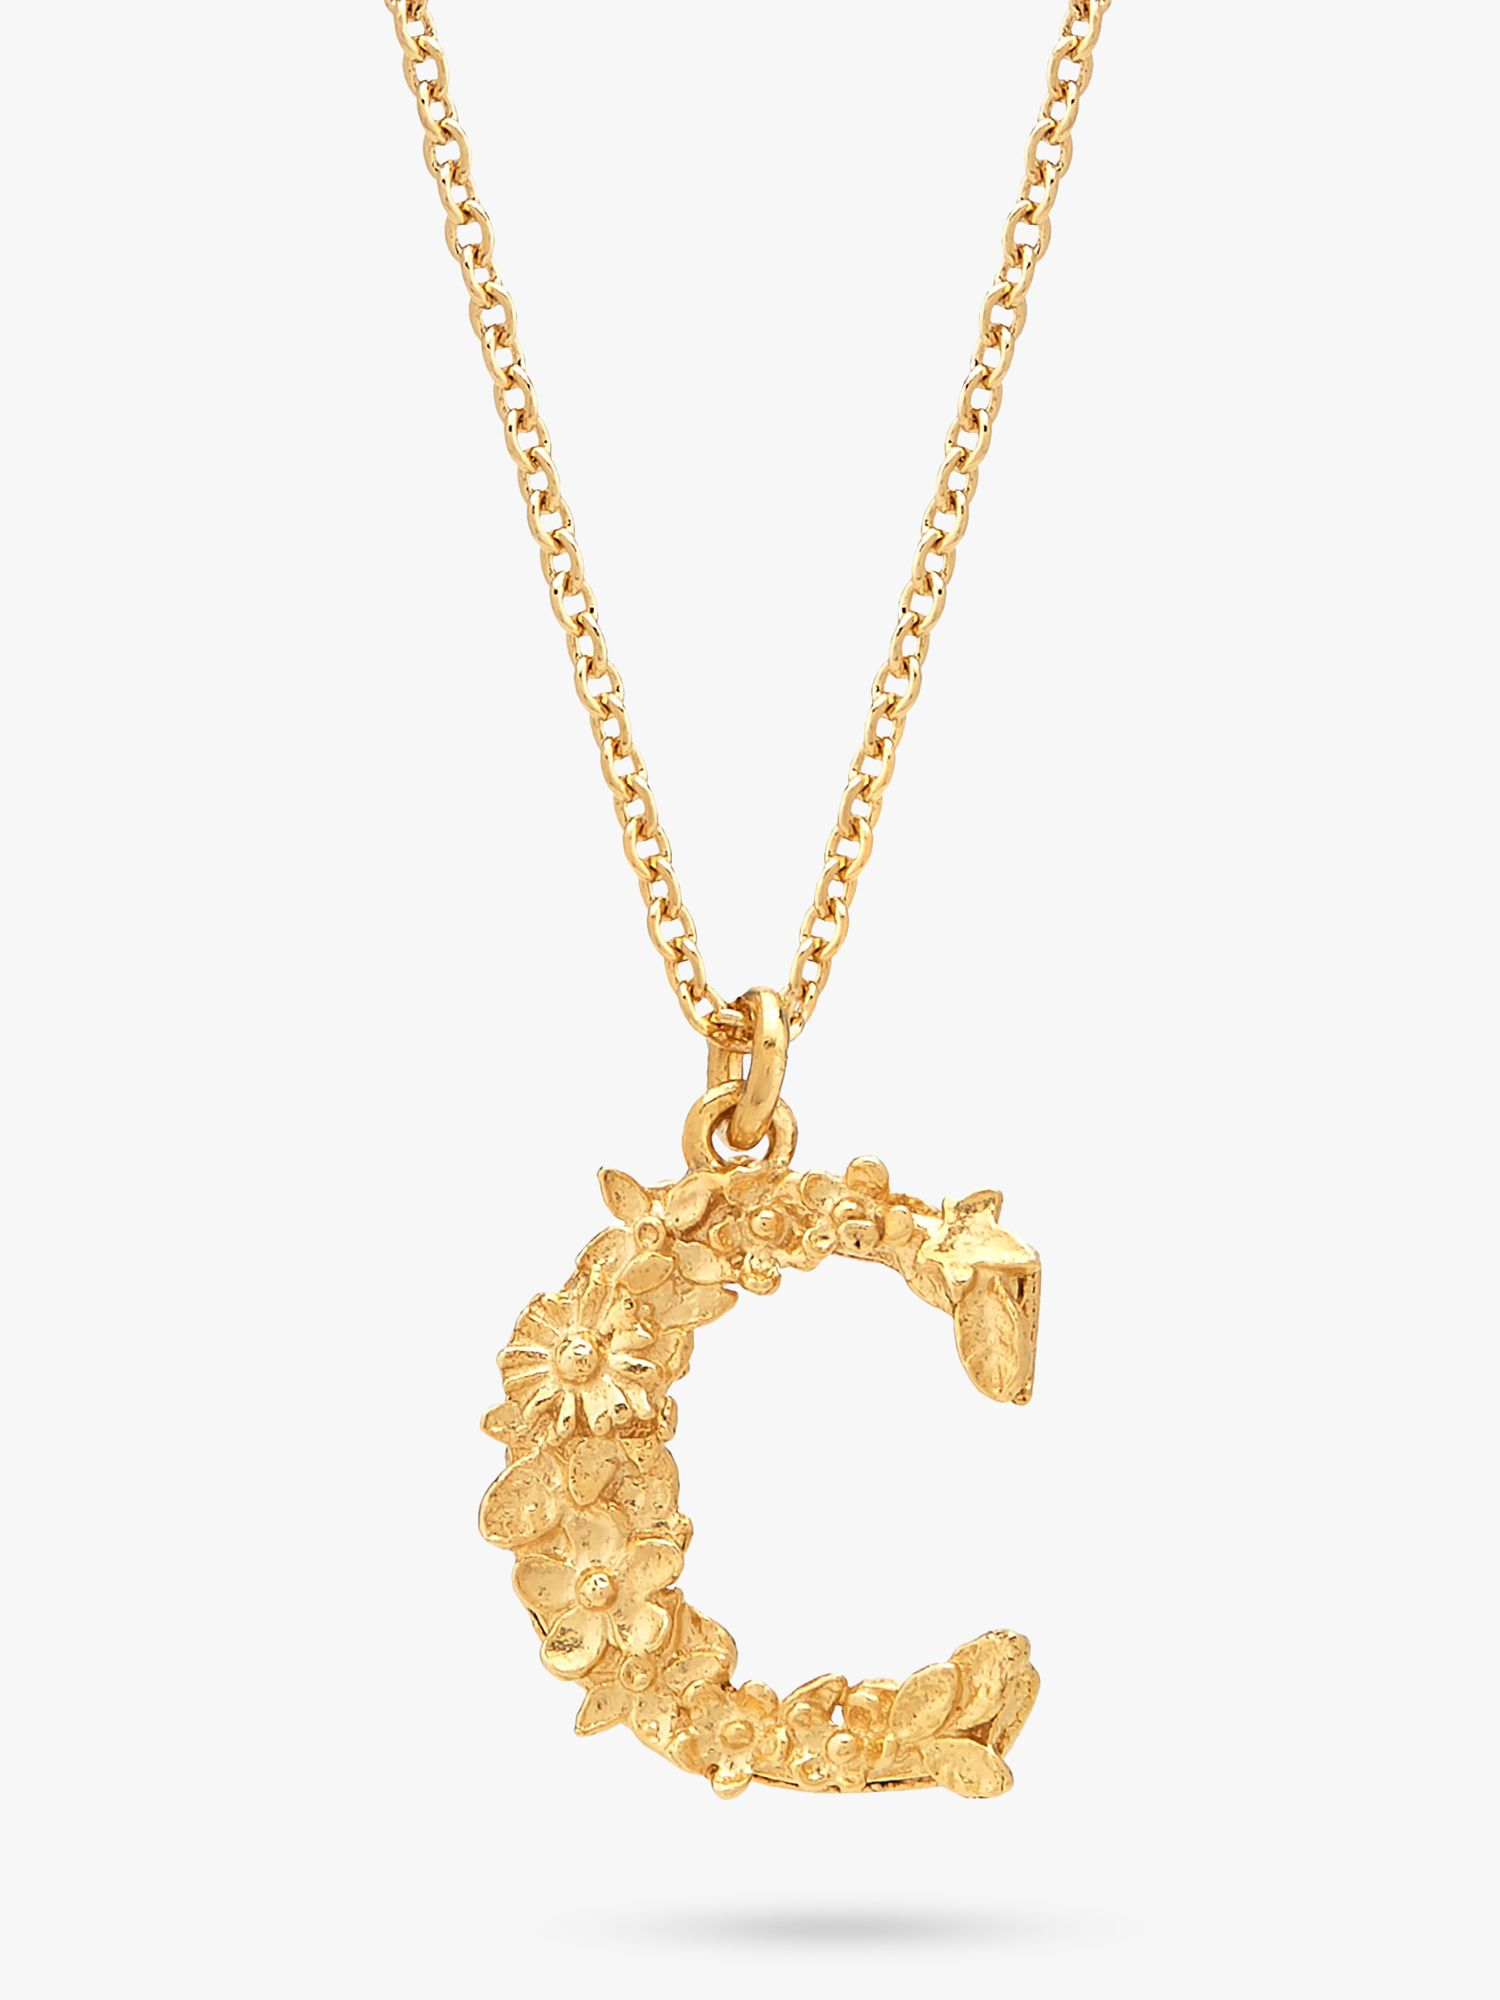 Alex Monroe Alex Monroe 22ct Gold Plated Sterling Silver Floral Letter Pendant Necklace